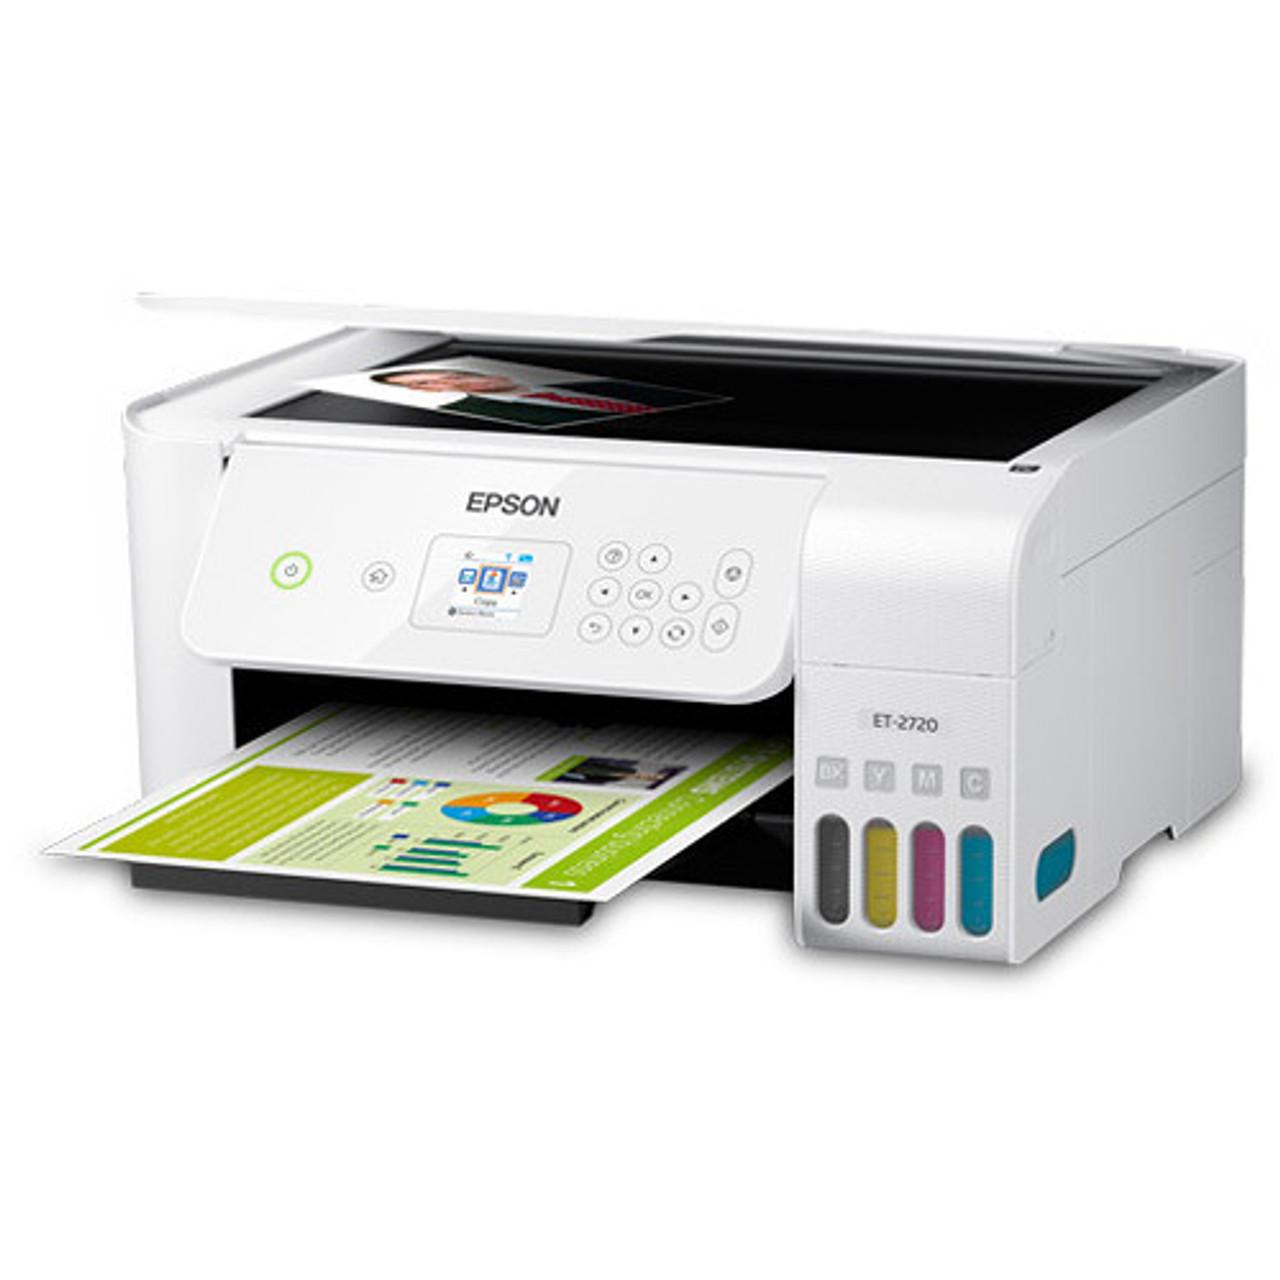 Epson C11CH42202-RB EcoTank ET-2720 All-In-One Inkjet Printer – Certified Refurbished